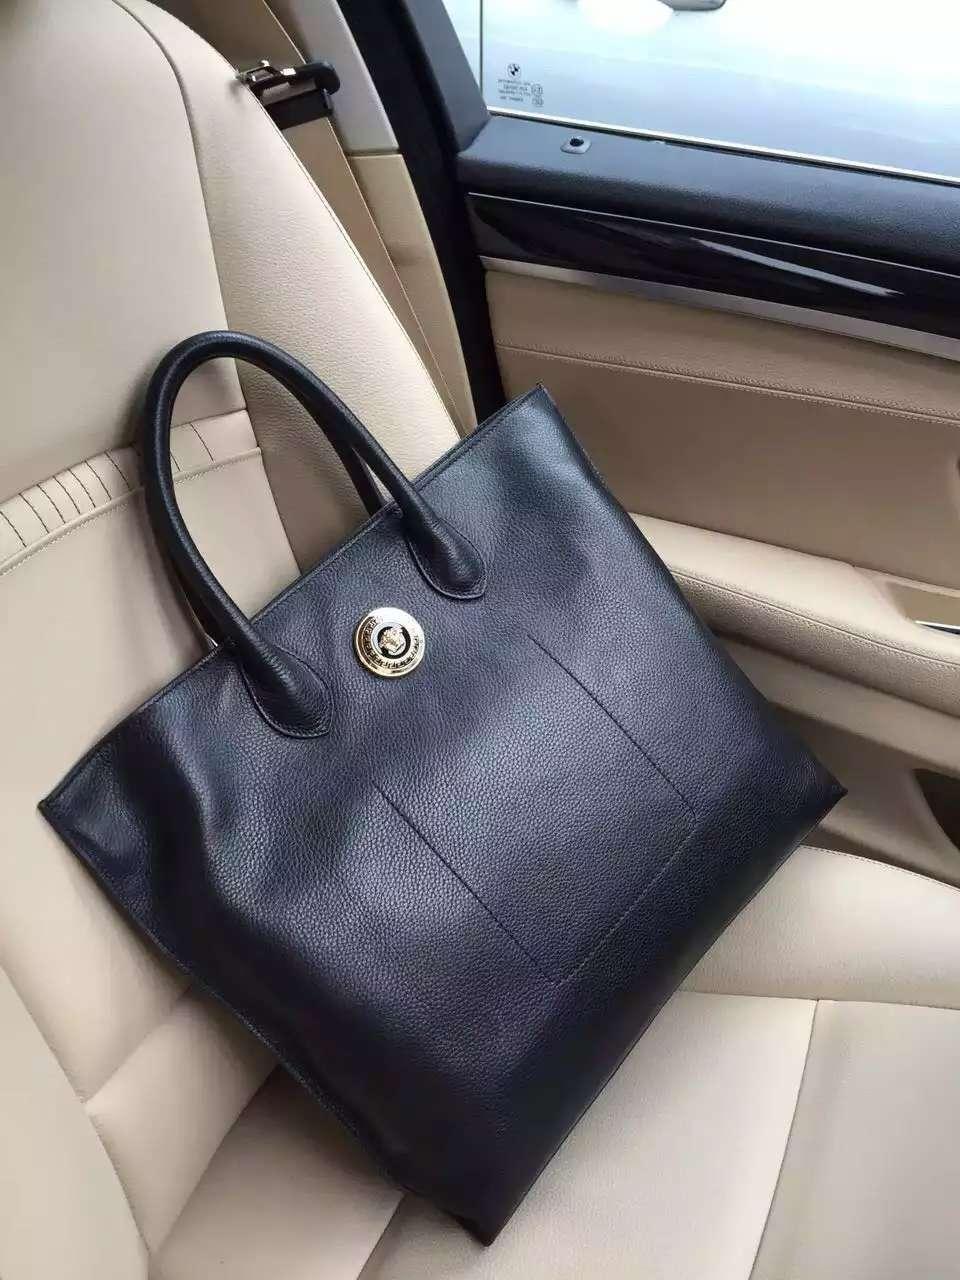 Versace 0132-1 Men Leather Briefcase Bag Black